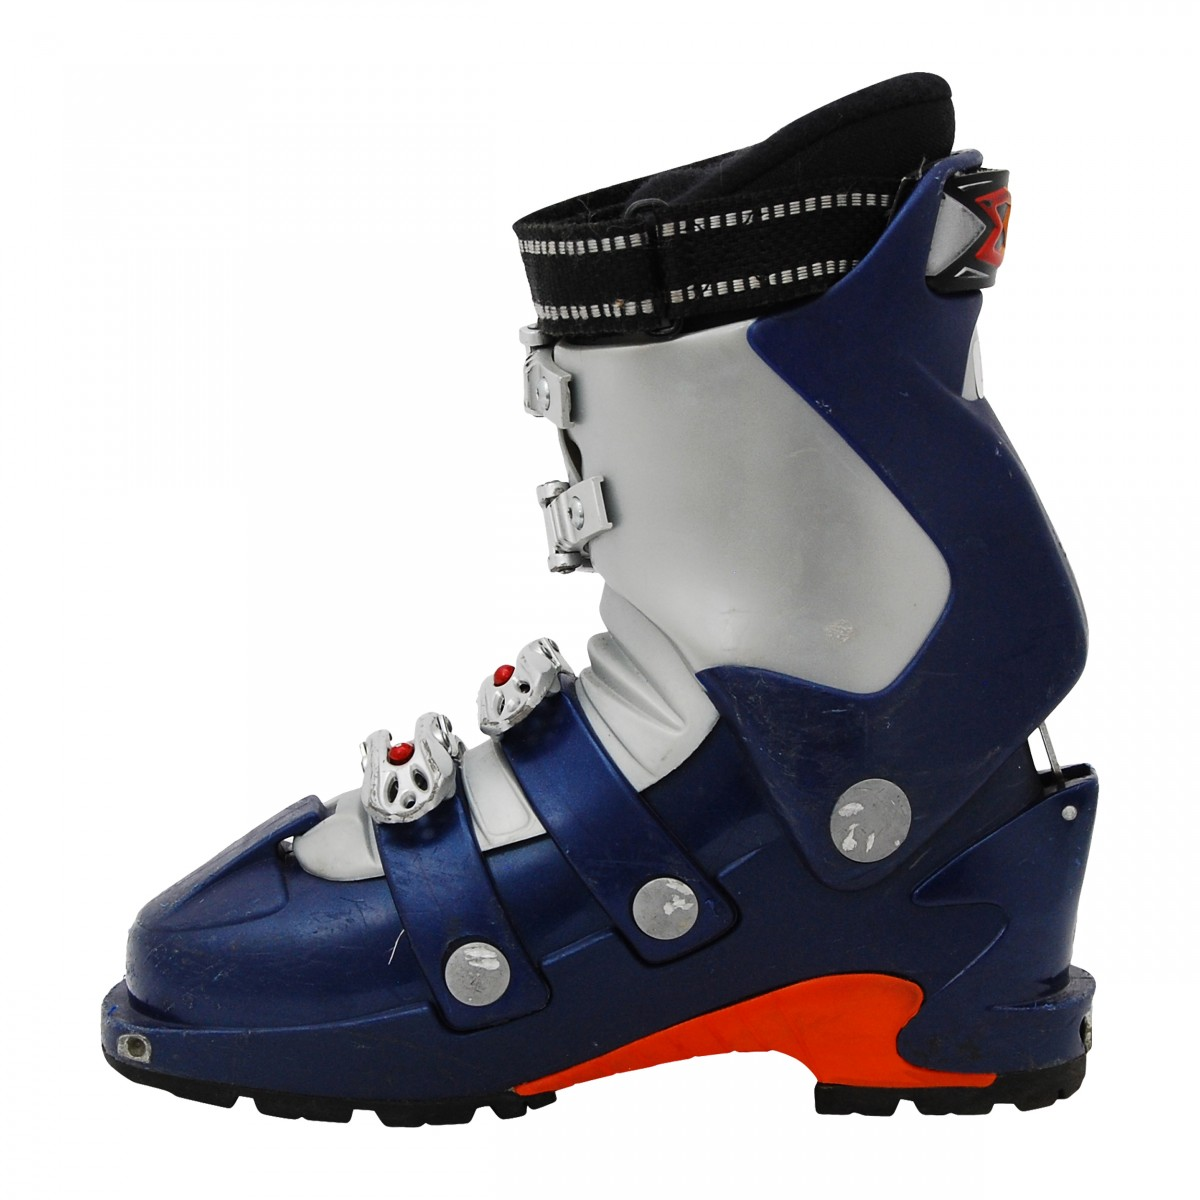 Chaussure-de-ski-rando-occasion-Garmont-Megaride-mg-bleu miniature 4